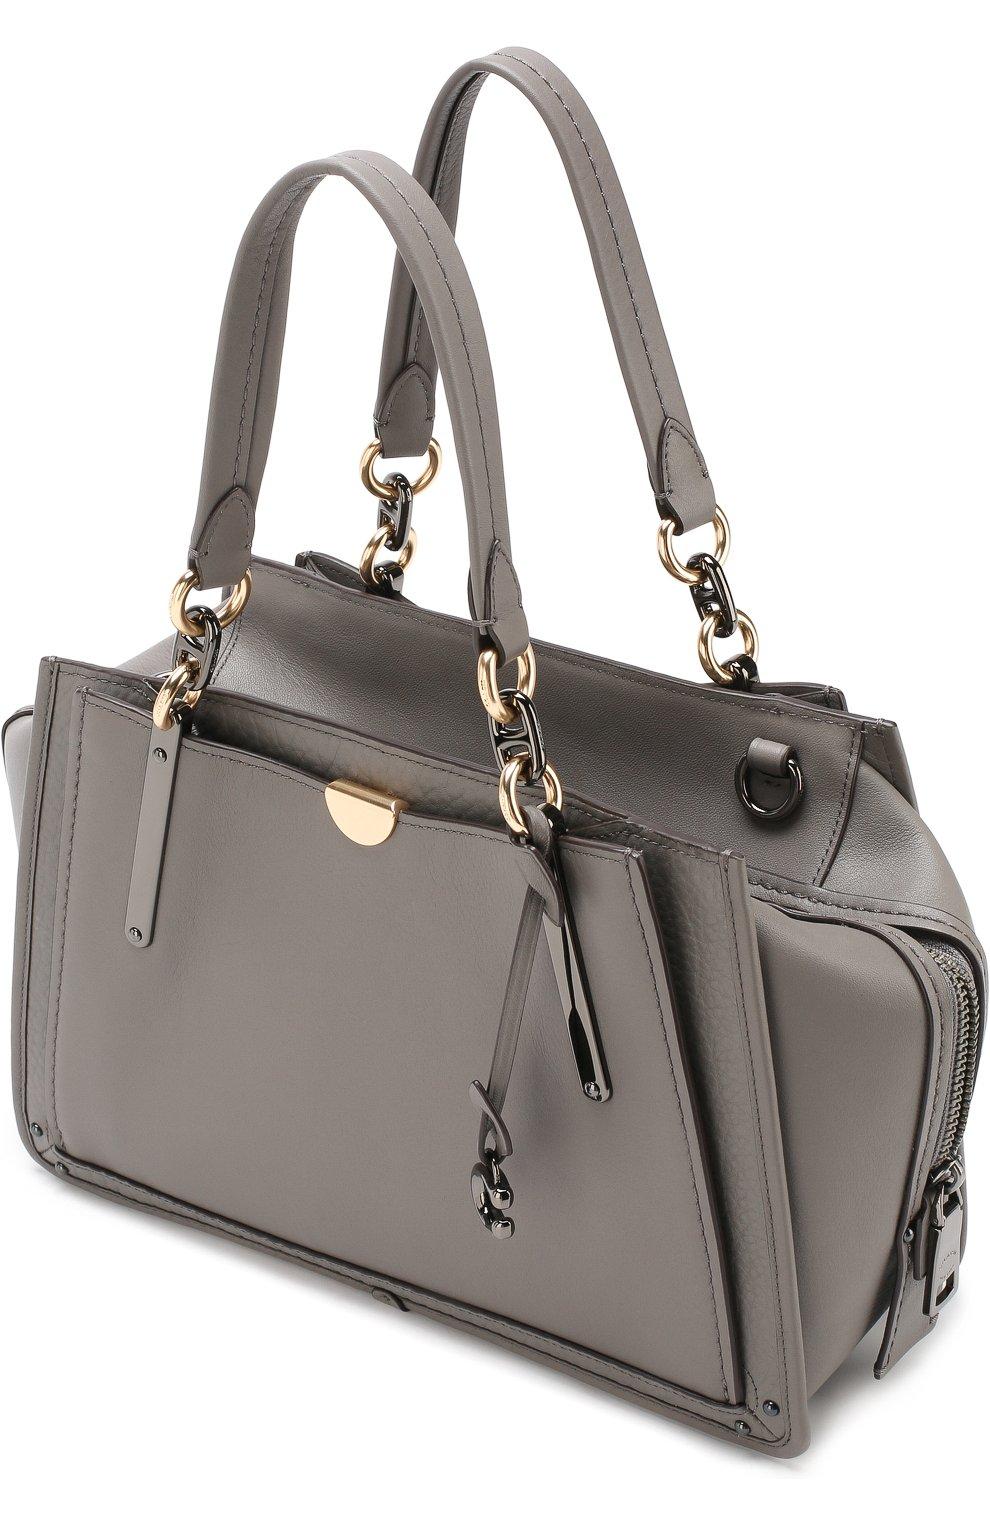 4ecc60eb3493 Женская сумка dreamer small COACH серая цвета — купить за 39800 руб ...